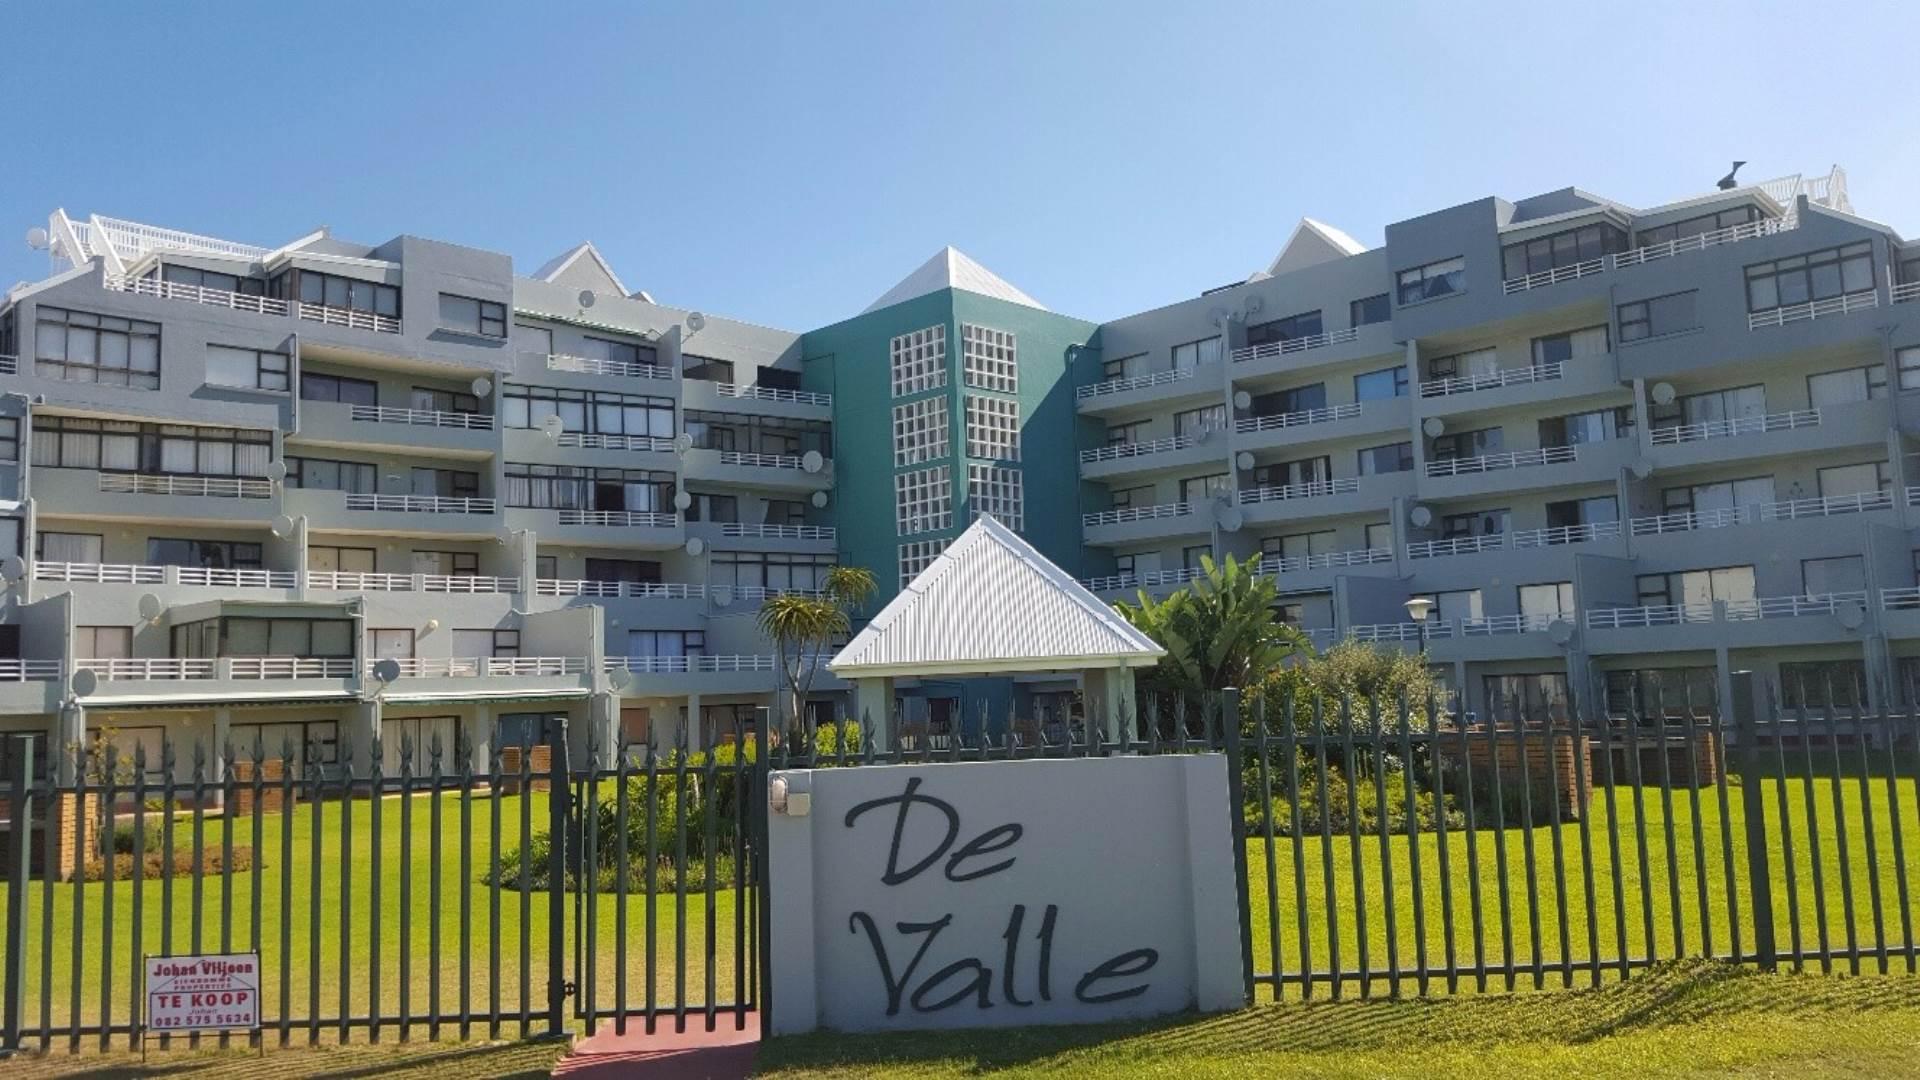 2 BedroomApartment For Sale In Diaz Beach